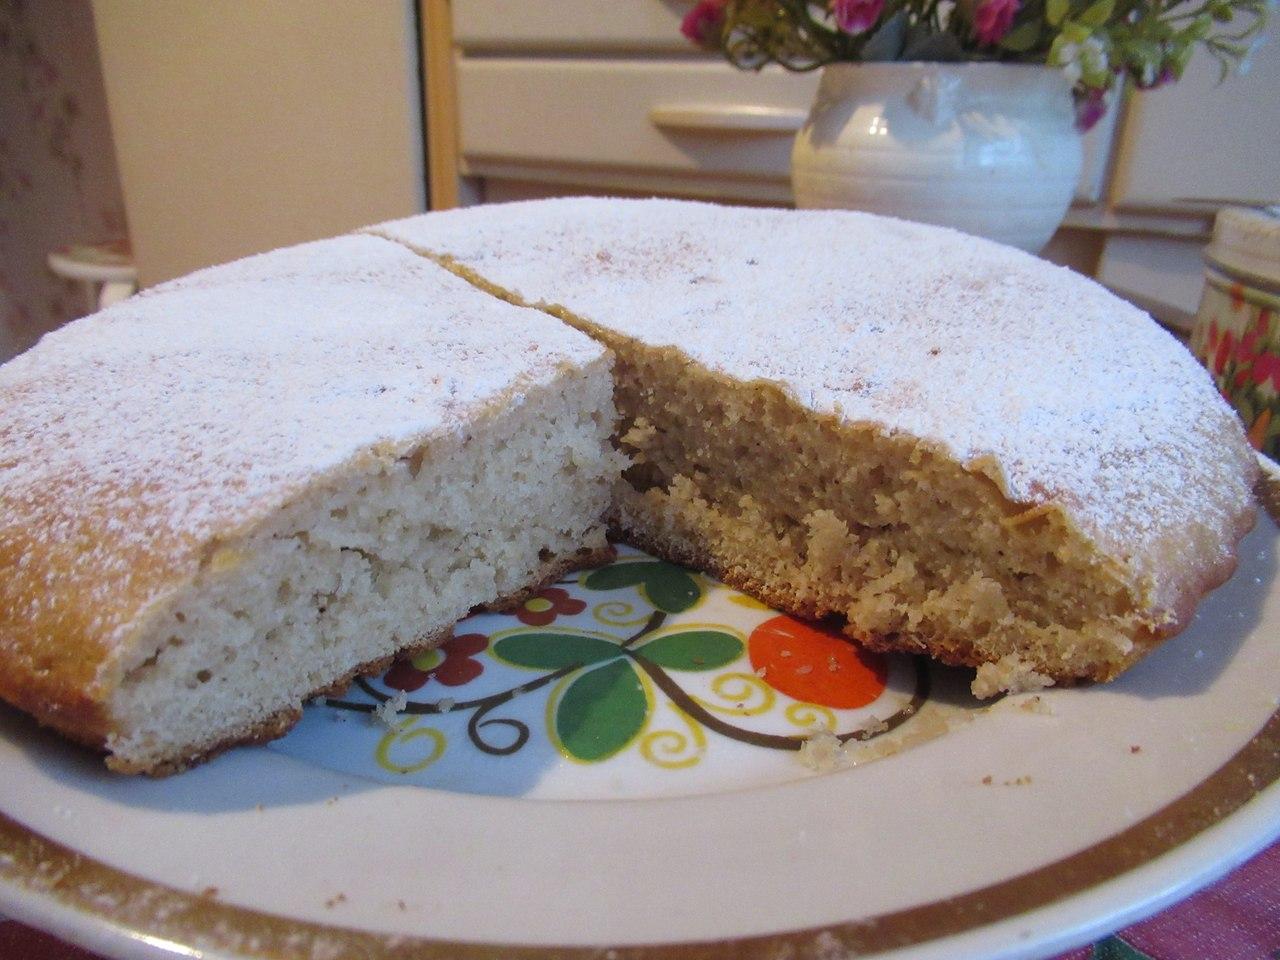 Пироги и тортики - Страница 2 S8JcEQm1O0w